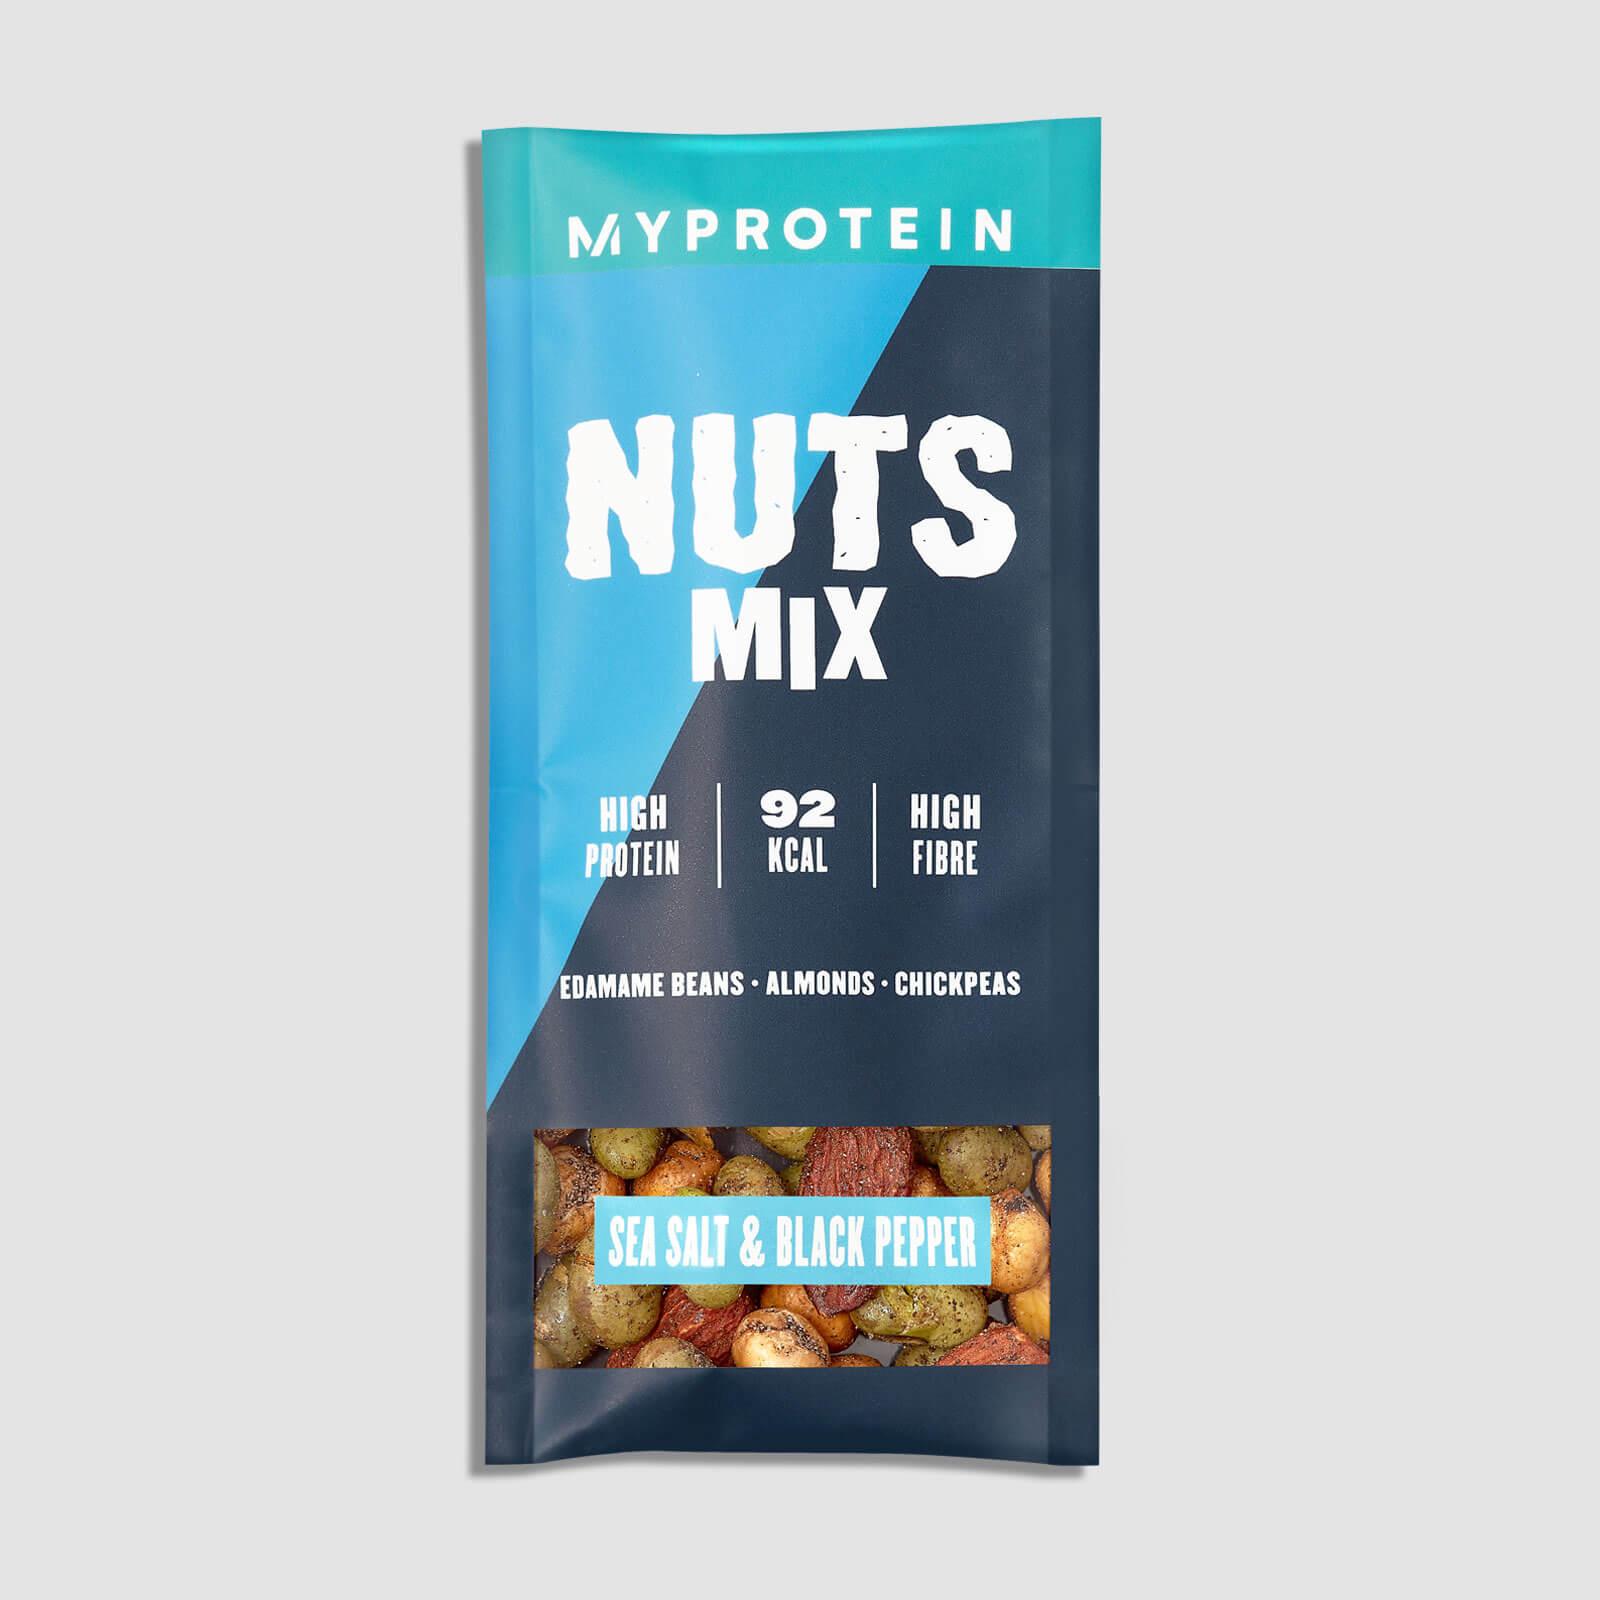 Myprotein N.U.T.S Mix Sachets (Sample) - 20g - Salt & Pepper